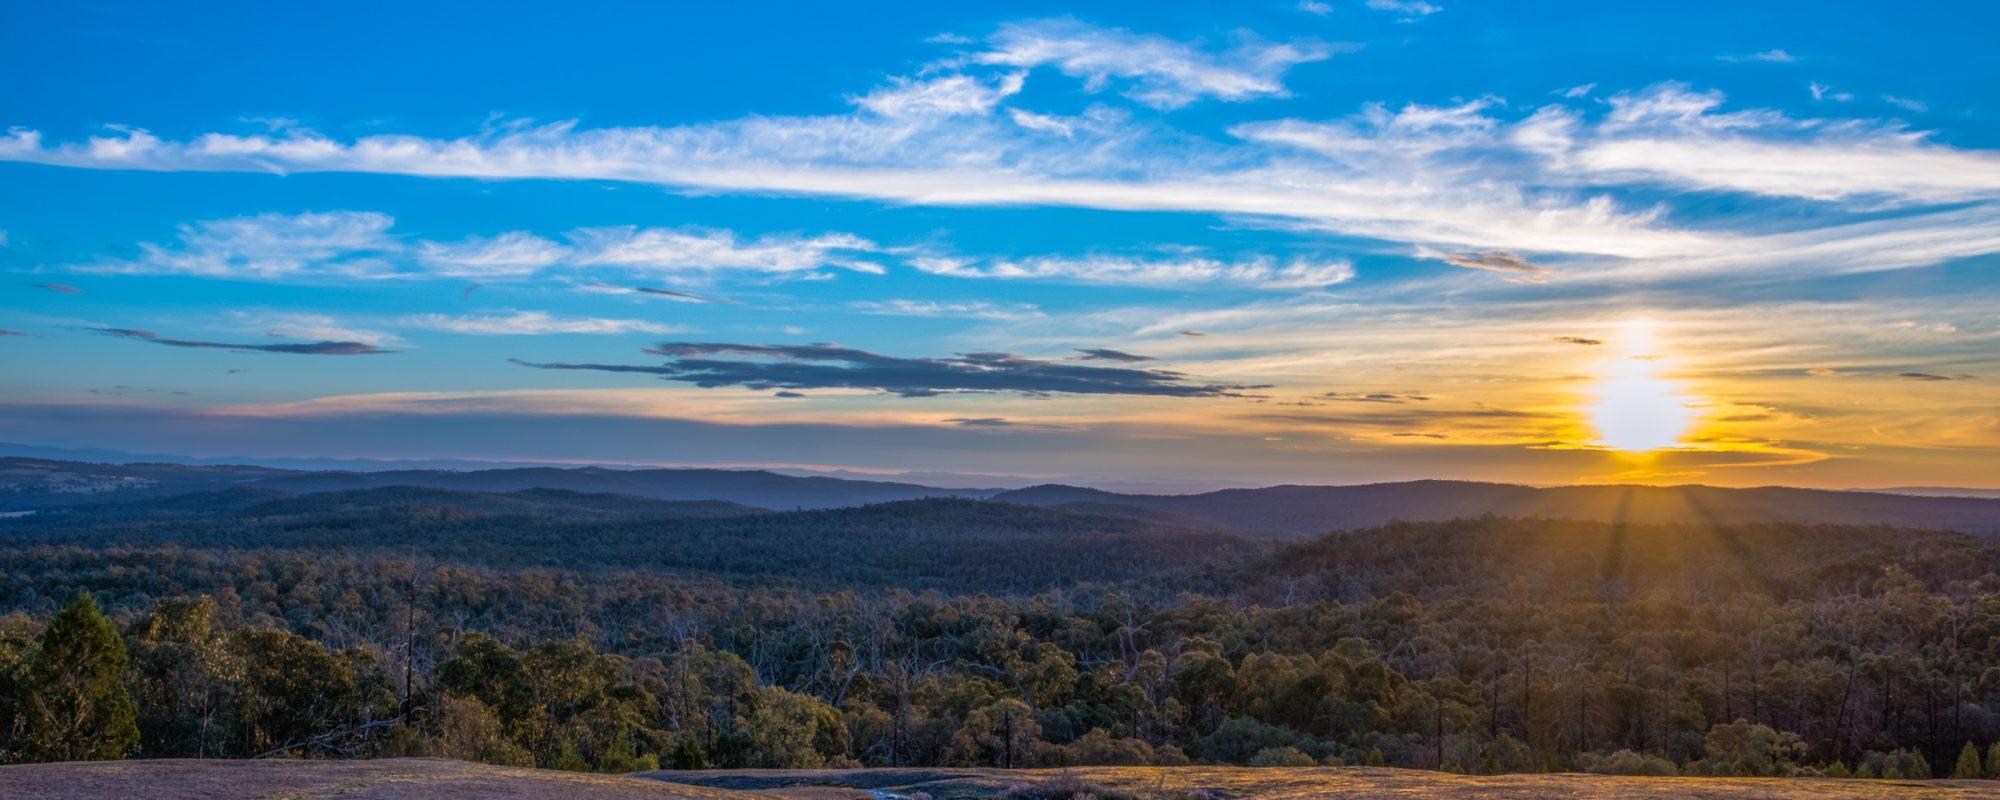 Mt Pilot National Park | Image credit: Kate Hanton